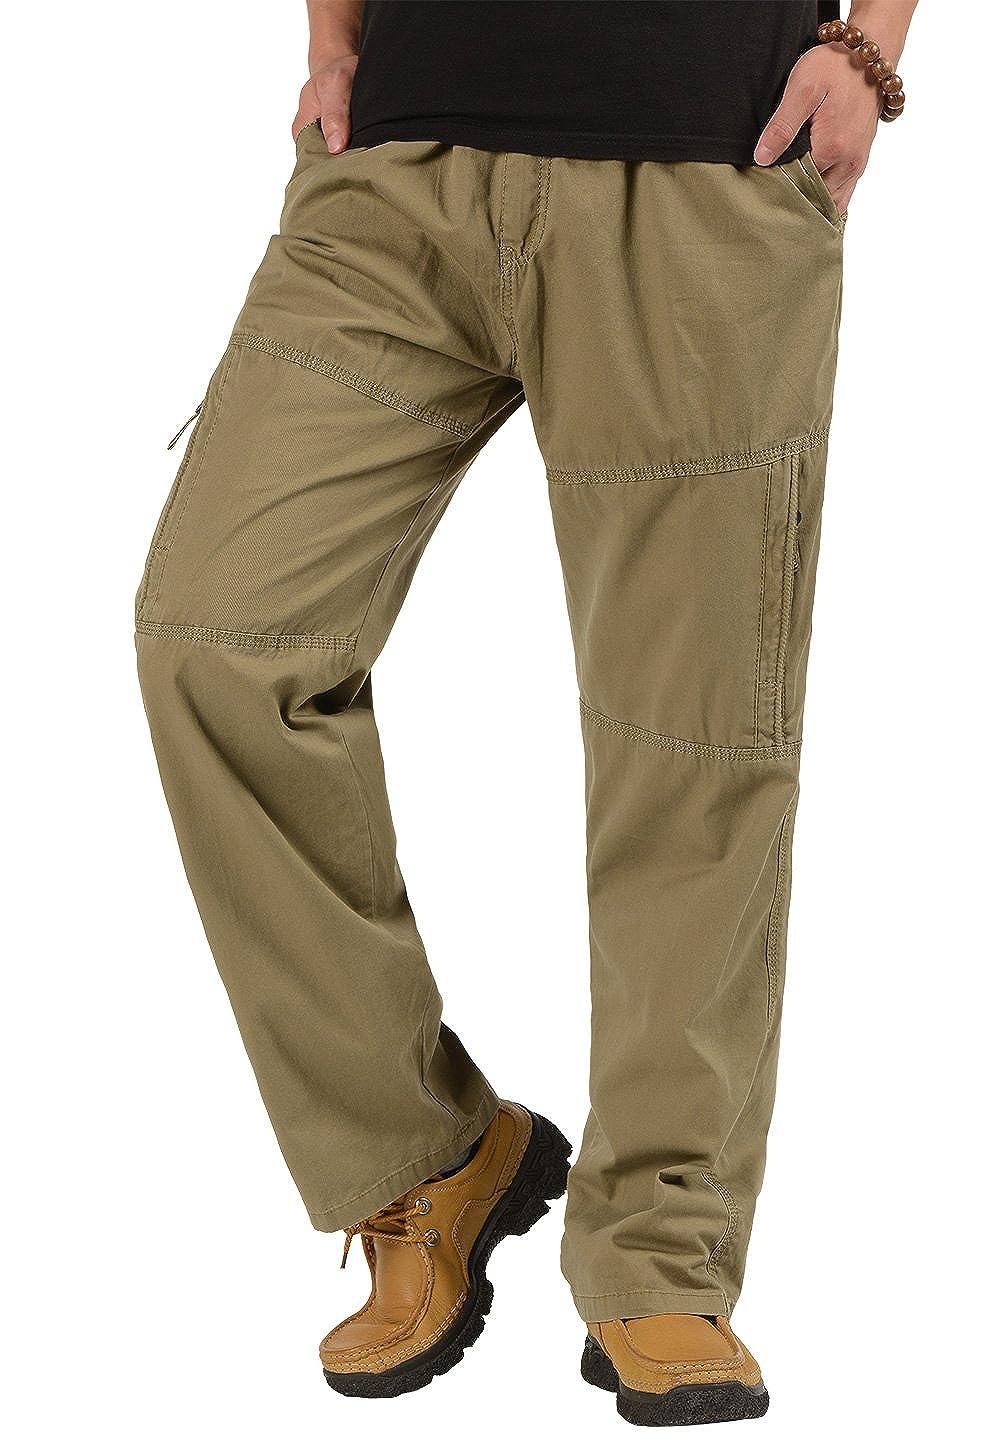 Men's Cotton Cargo Pants Casual Full Elastic Waist Work Pant CardanWolf